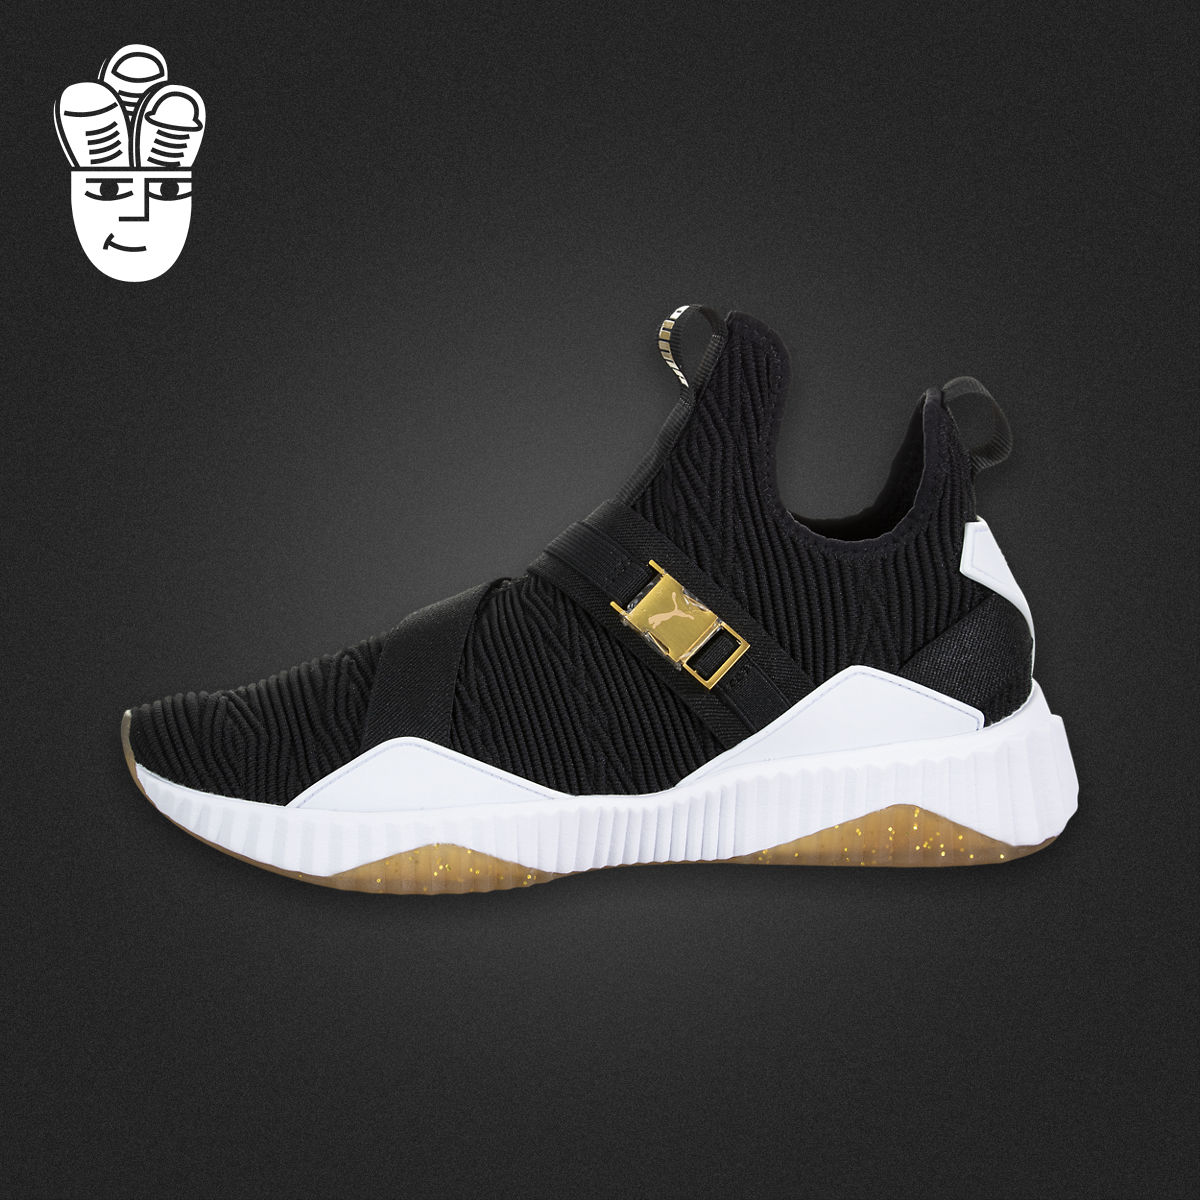 Puma Defy Mid Varsity 彪马女子中帮篮球鞋 舒适透气运动鞋